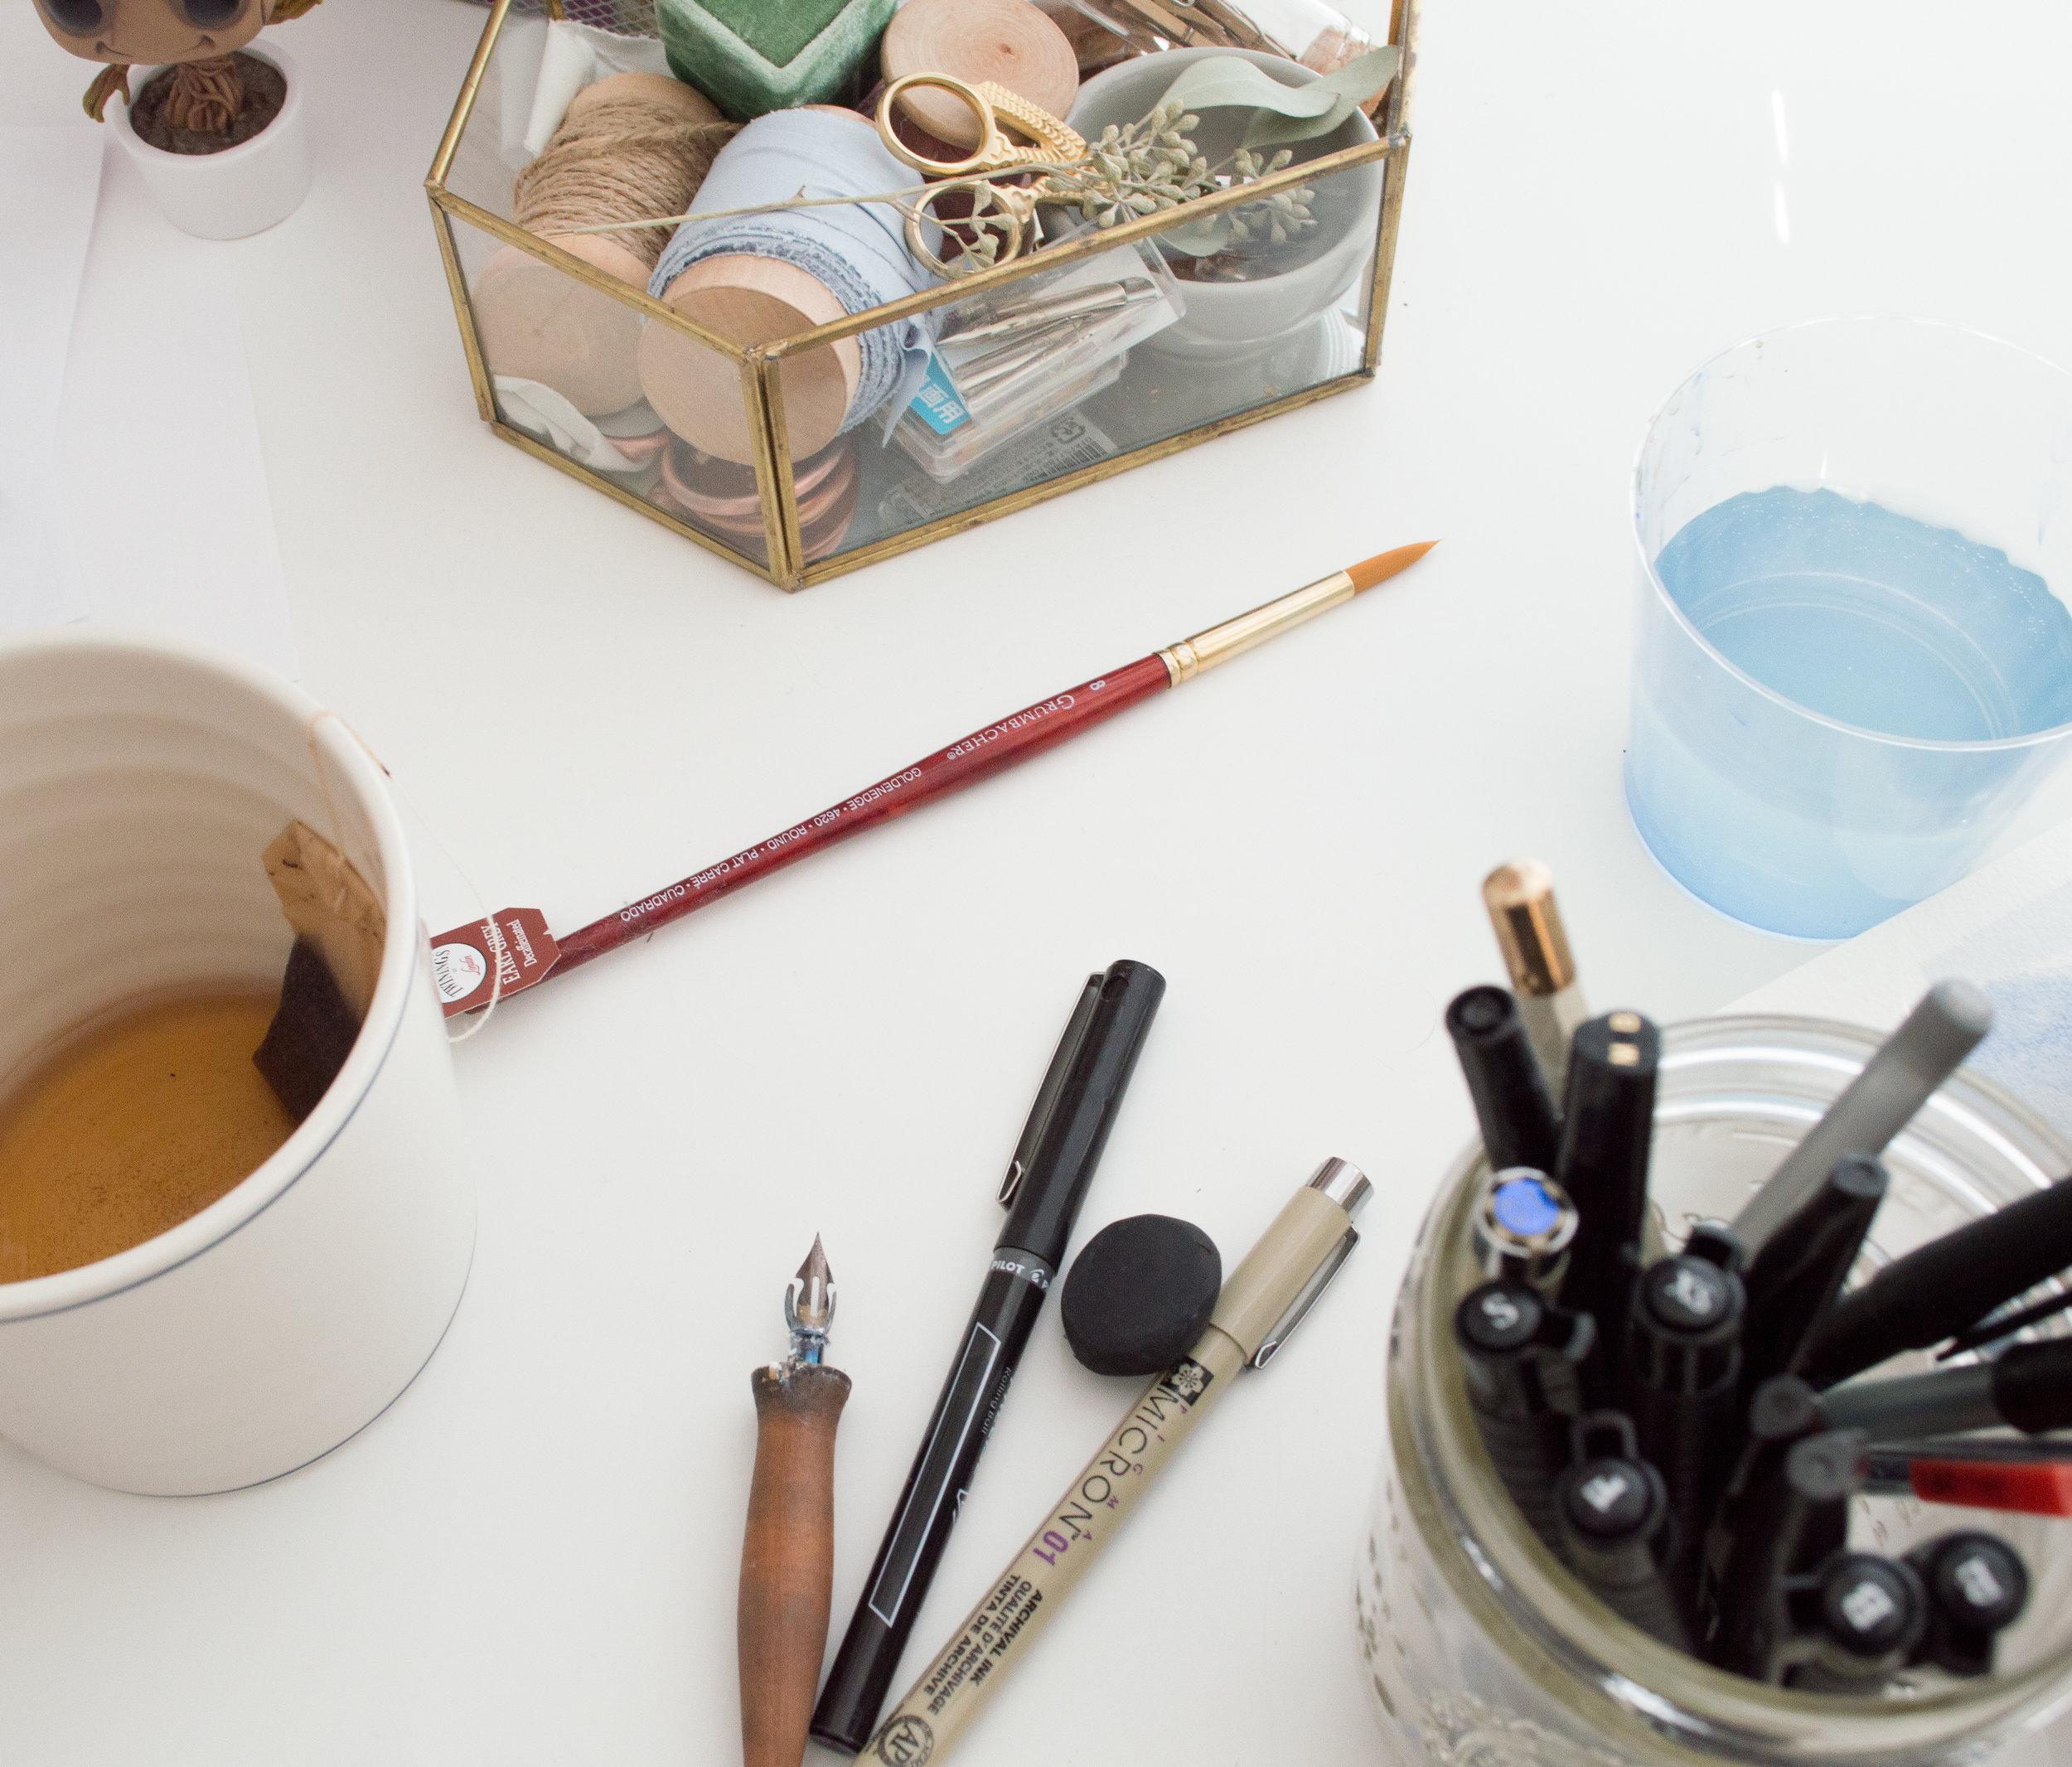 calligraphy supplies, watercolor supplies, marietta calligrapher, wedding calligrapher